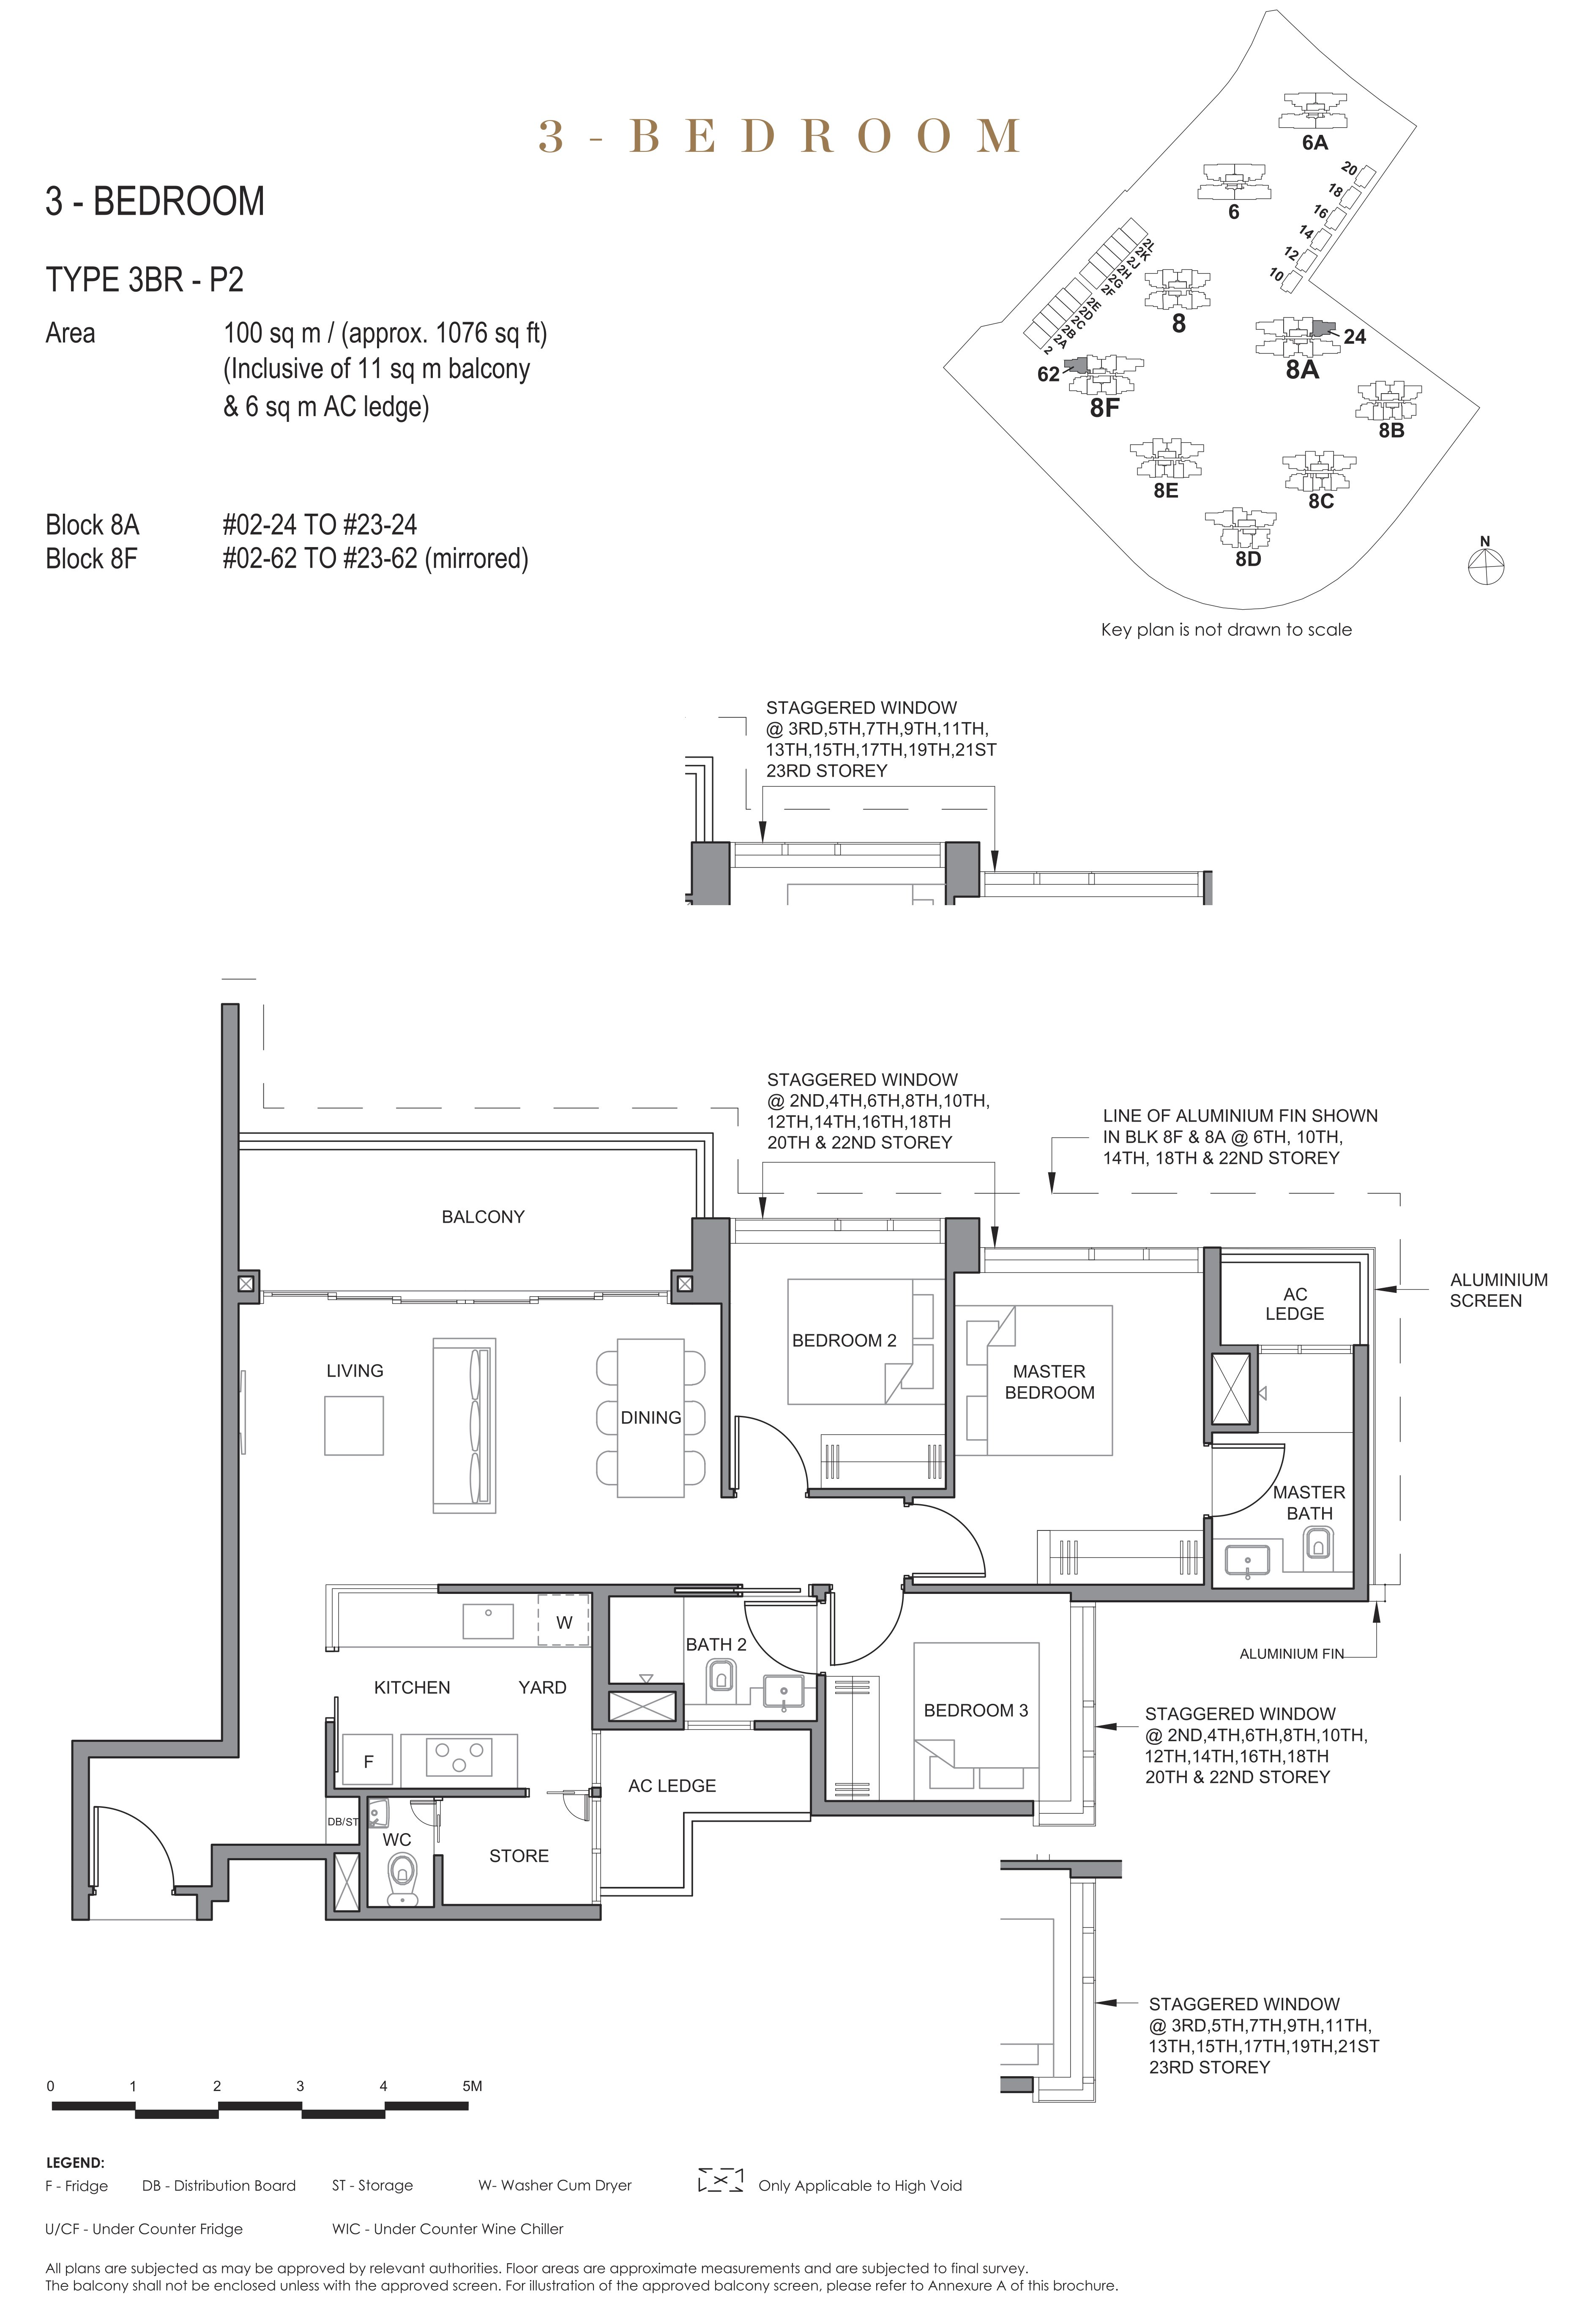 Parc Clematis 锦泰门第 elegance 3 bedroom 3卧房 3BR-P2